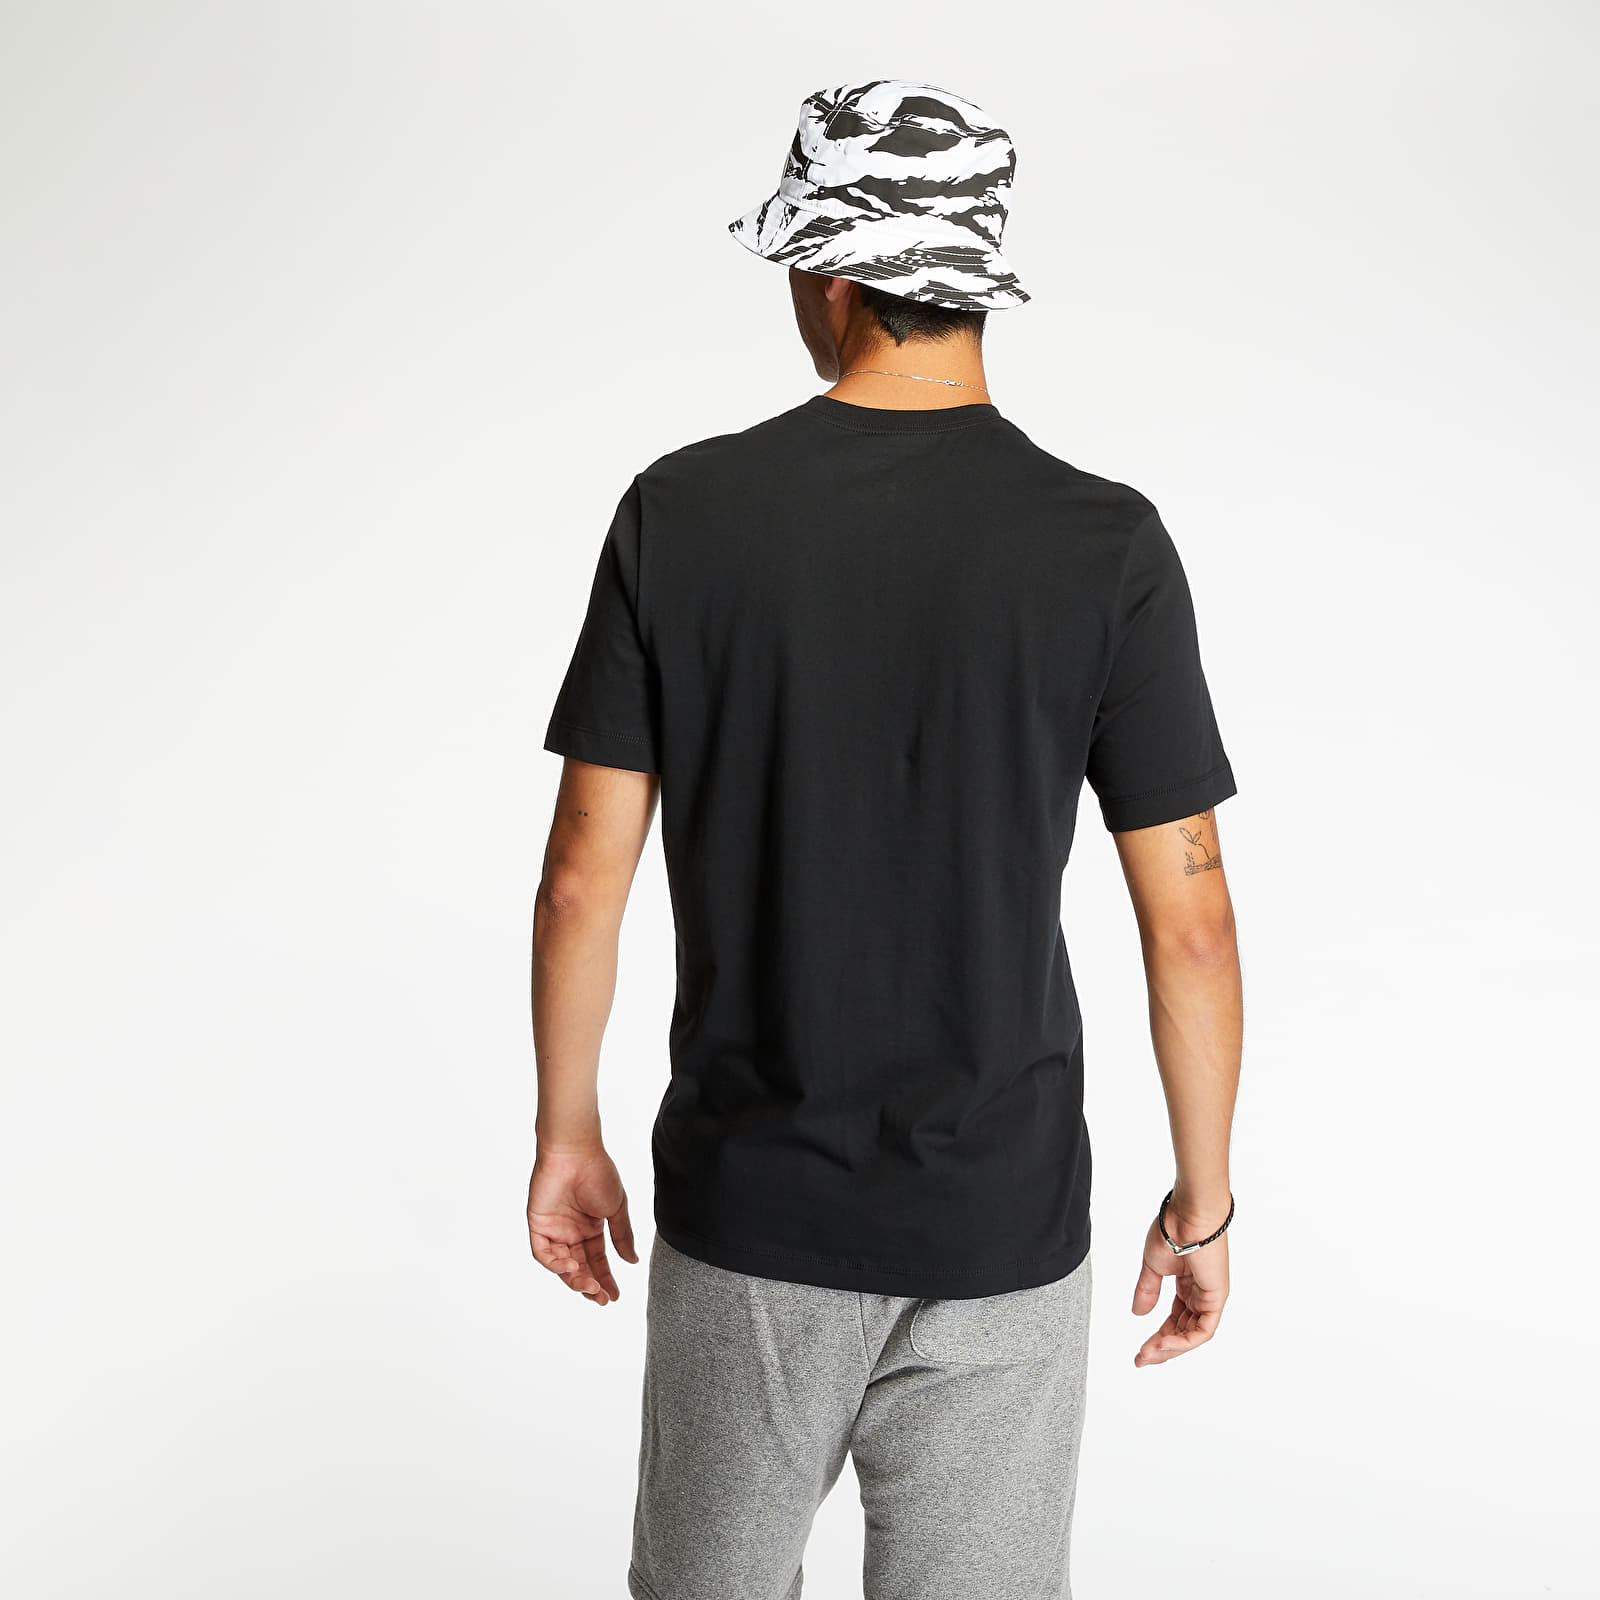 Nike Sportswear Basketball Photo Tee Black